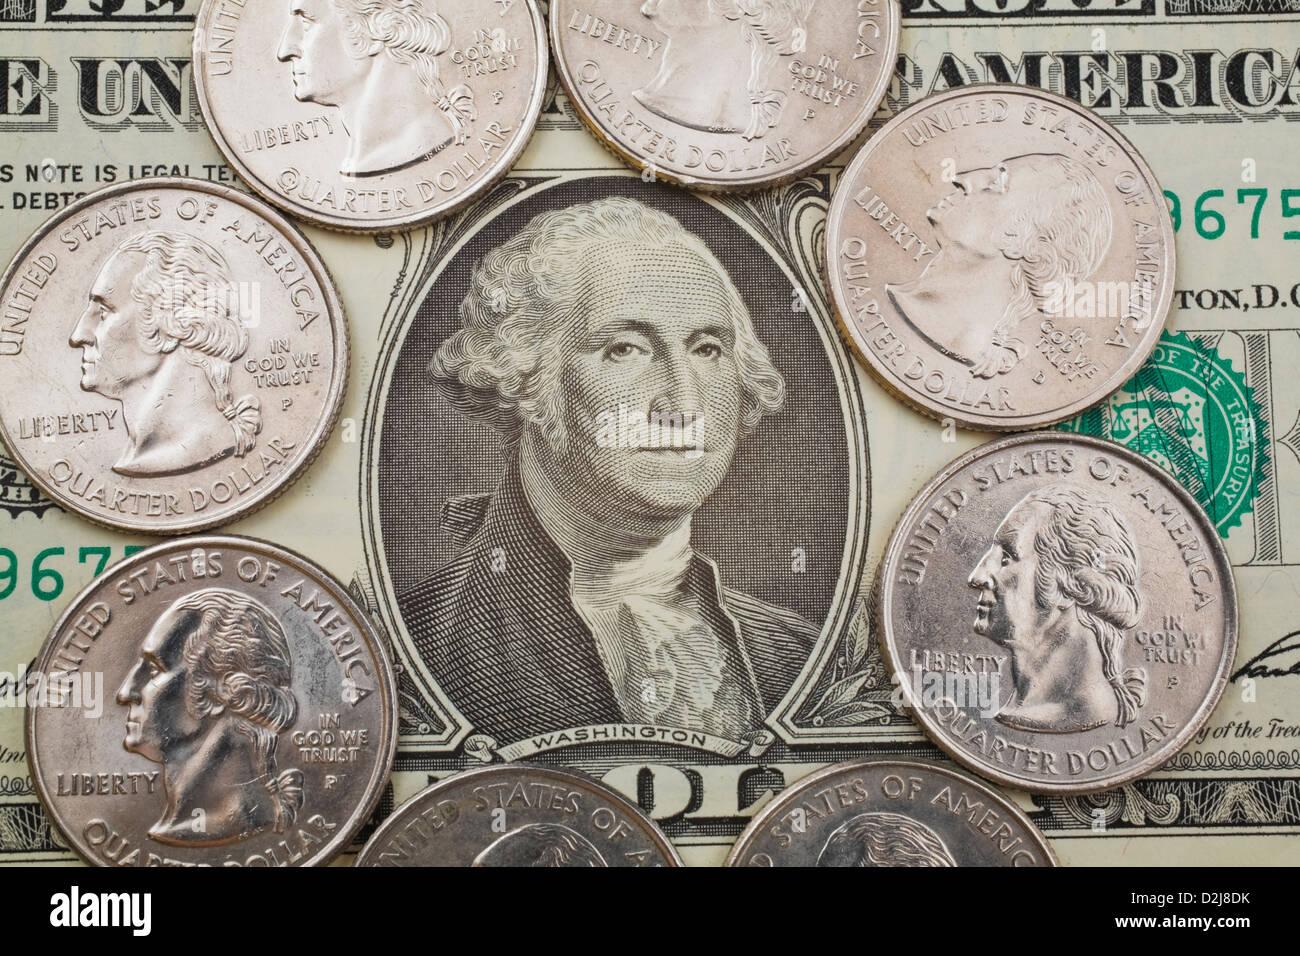 Portrait Of George Washington On A Us One Dollar Bill And